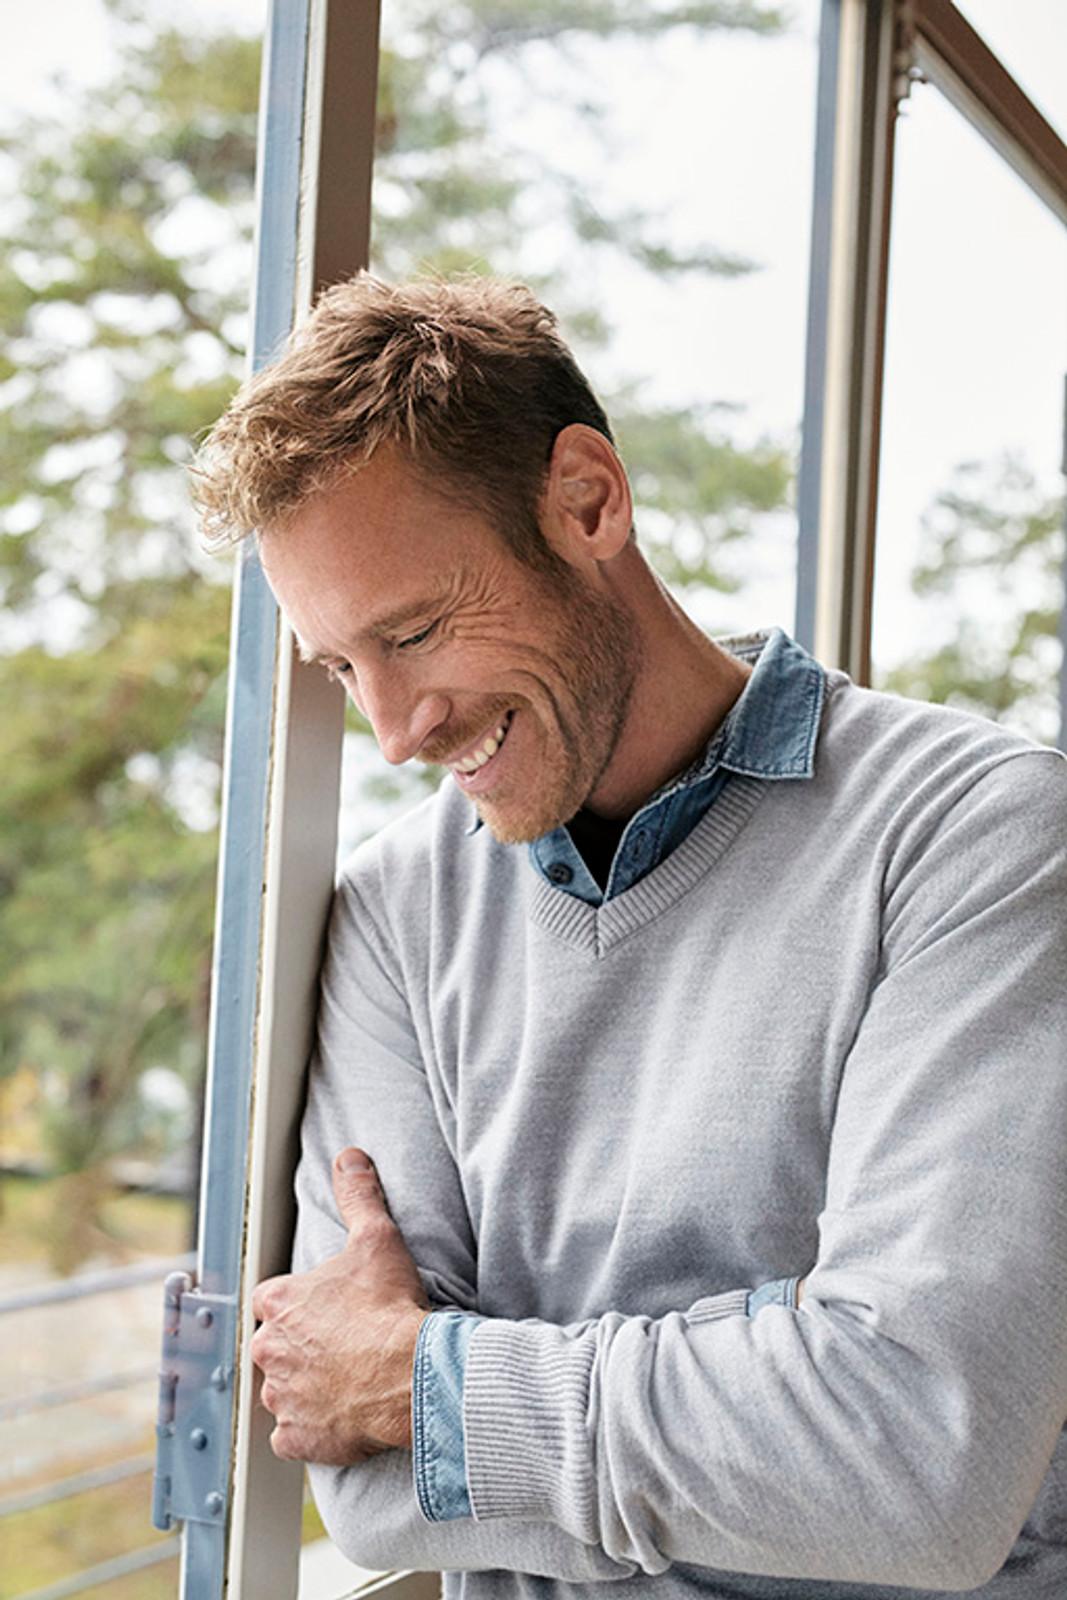 Man by window wearing Dale of Norway's mens Harald sweater in Light Grey Melange, 92412-E